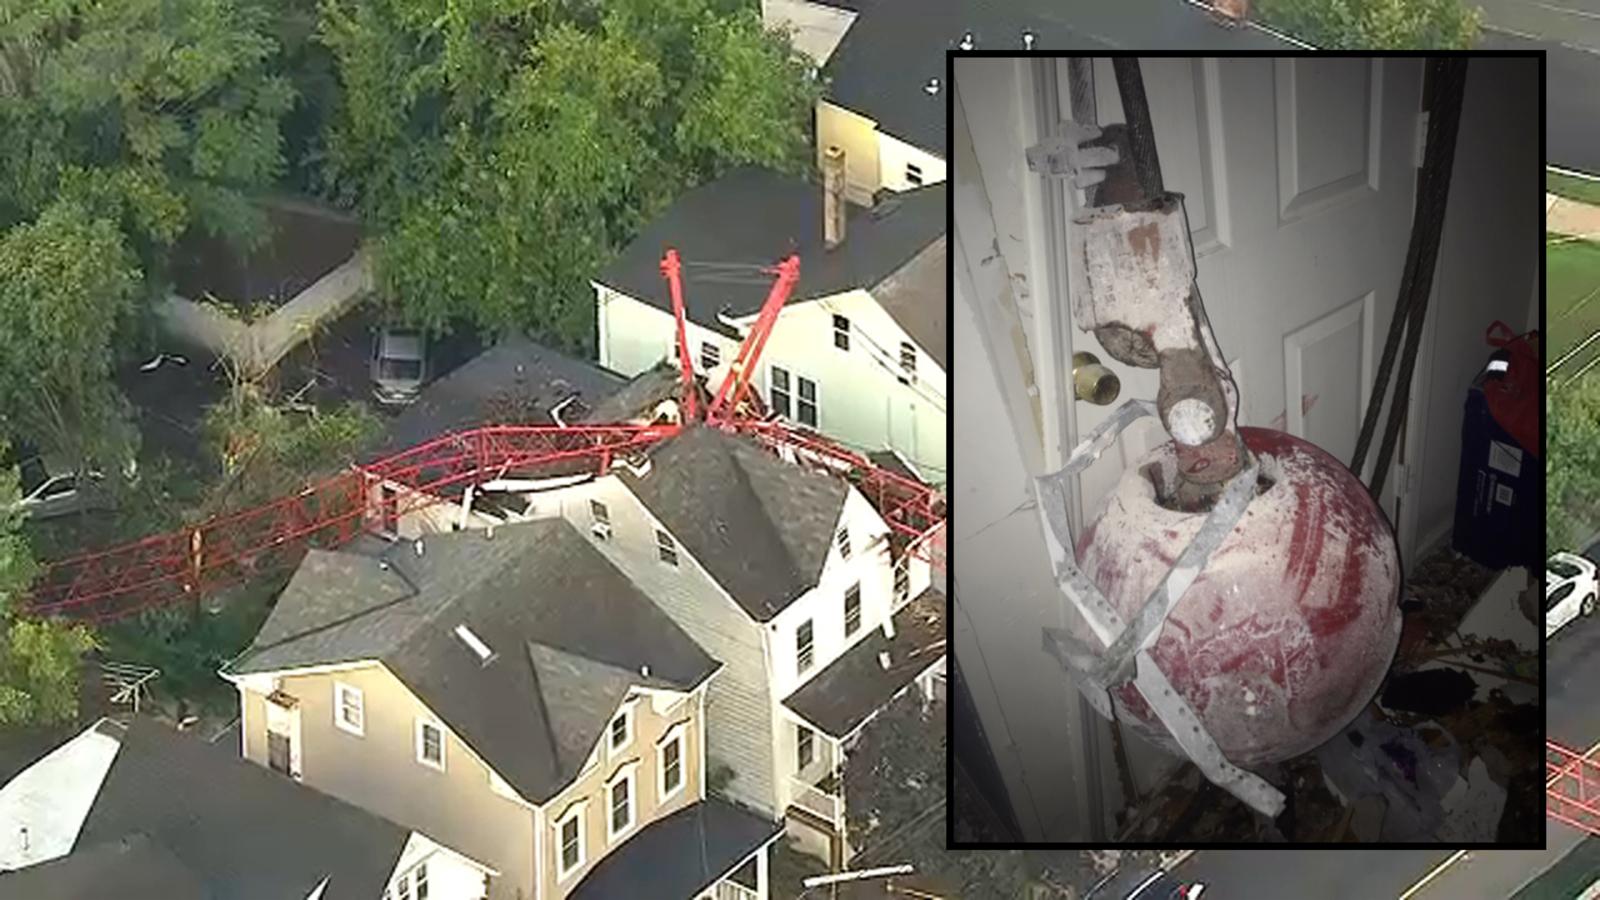 Crane comes crashing down onto 2 homes in New Brunswick ...